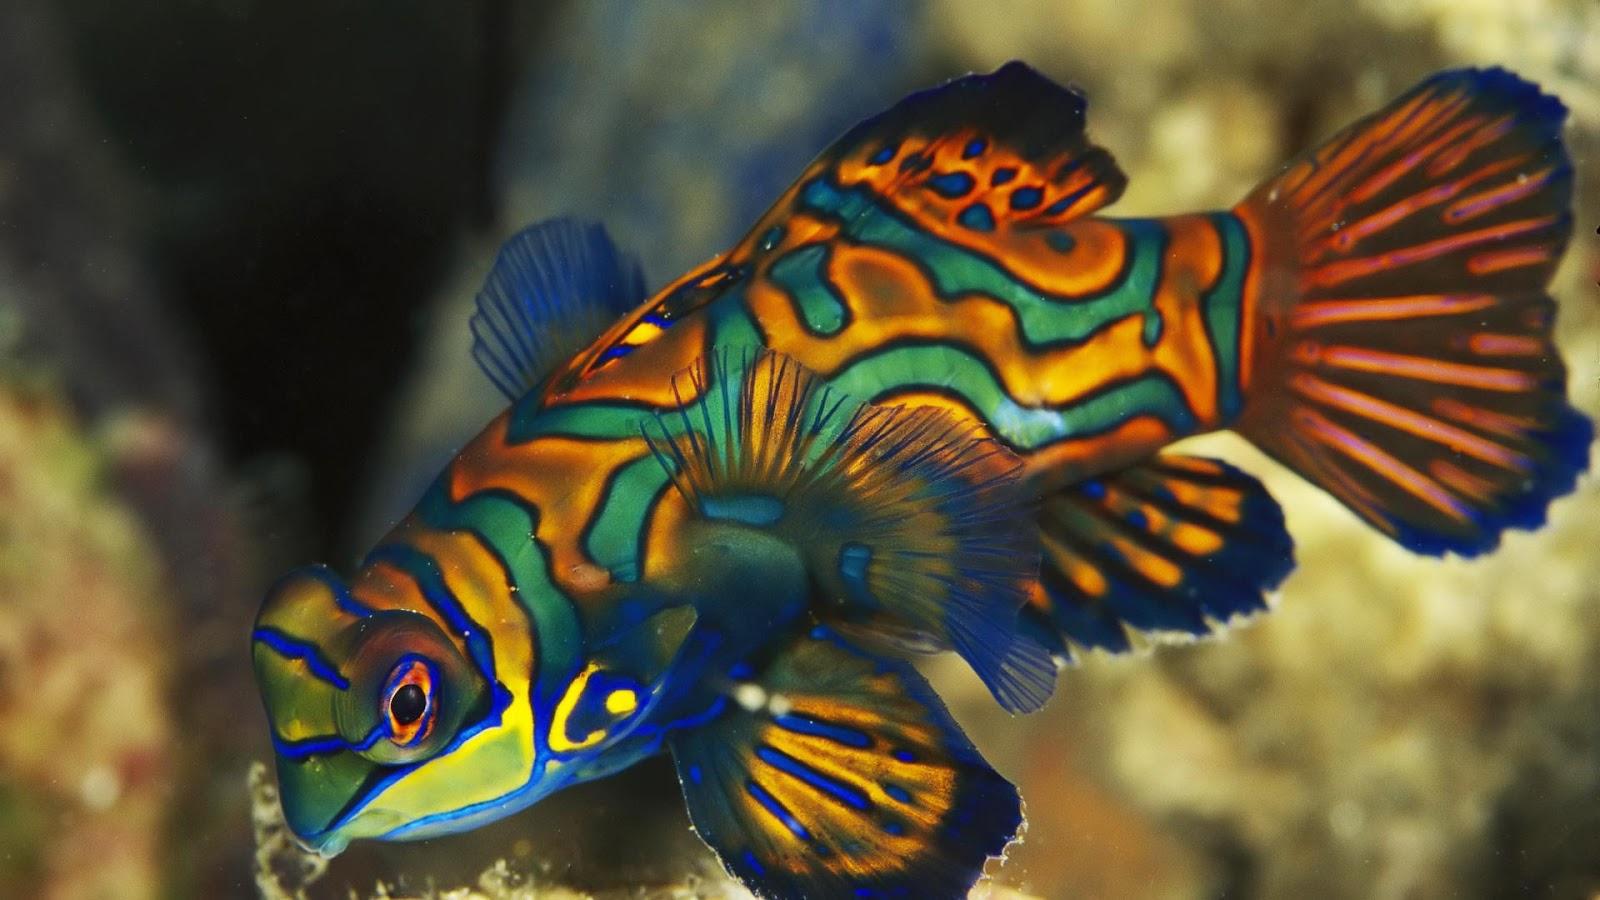 Aquarium Fish - Mandarin Fish - Pets Cute and Docile